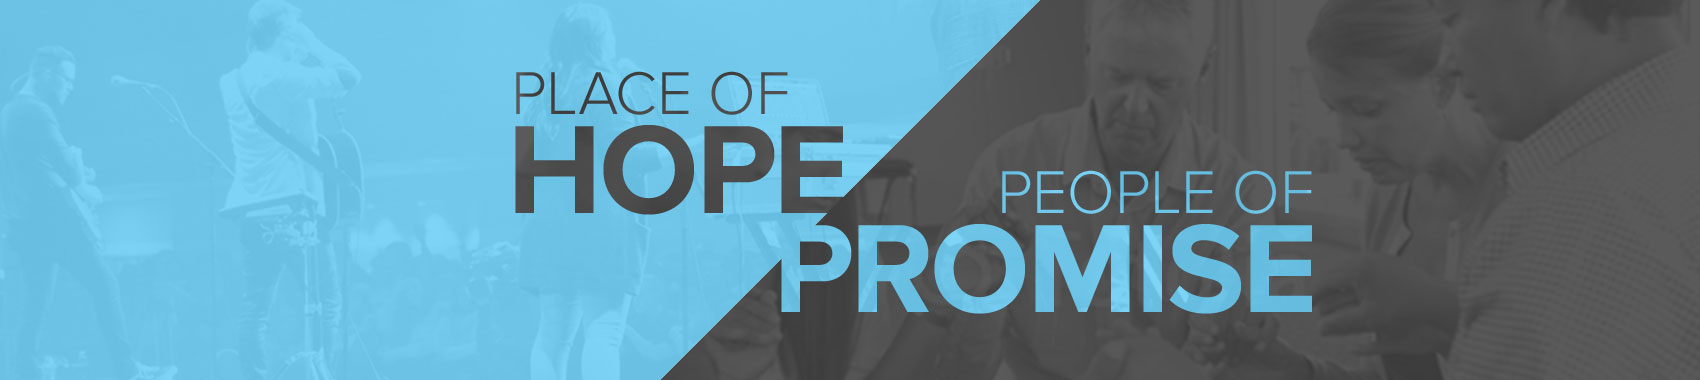 iphc-placeofhope-peopleofpromise-slide